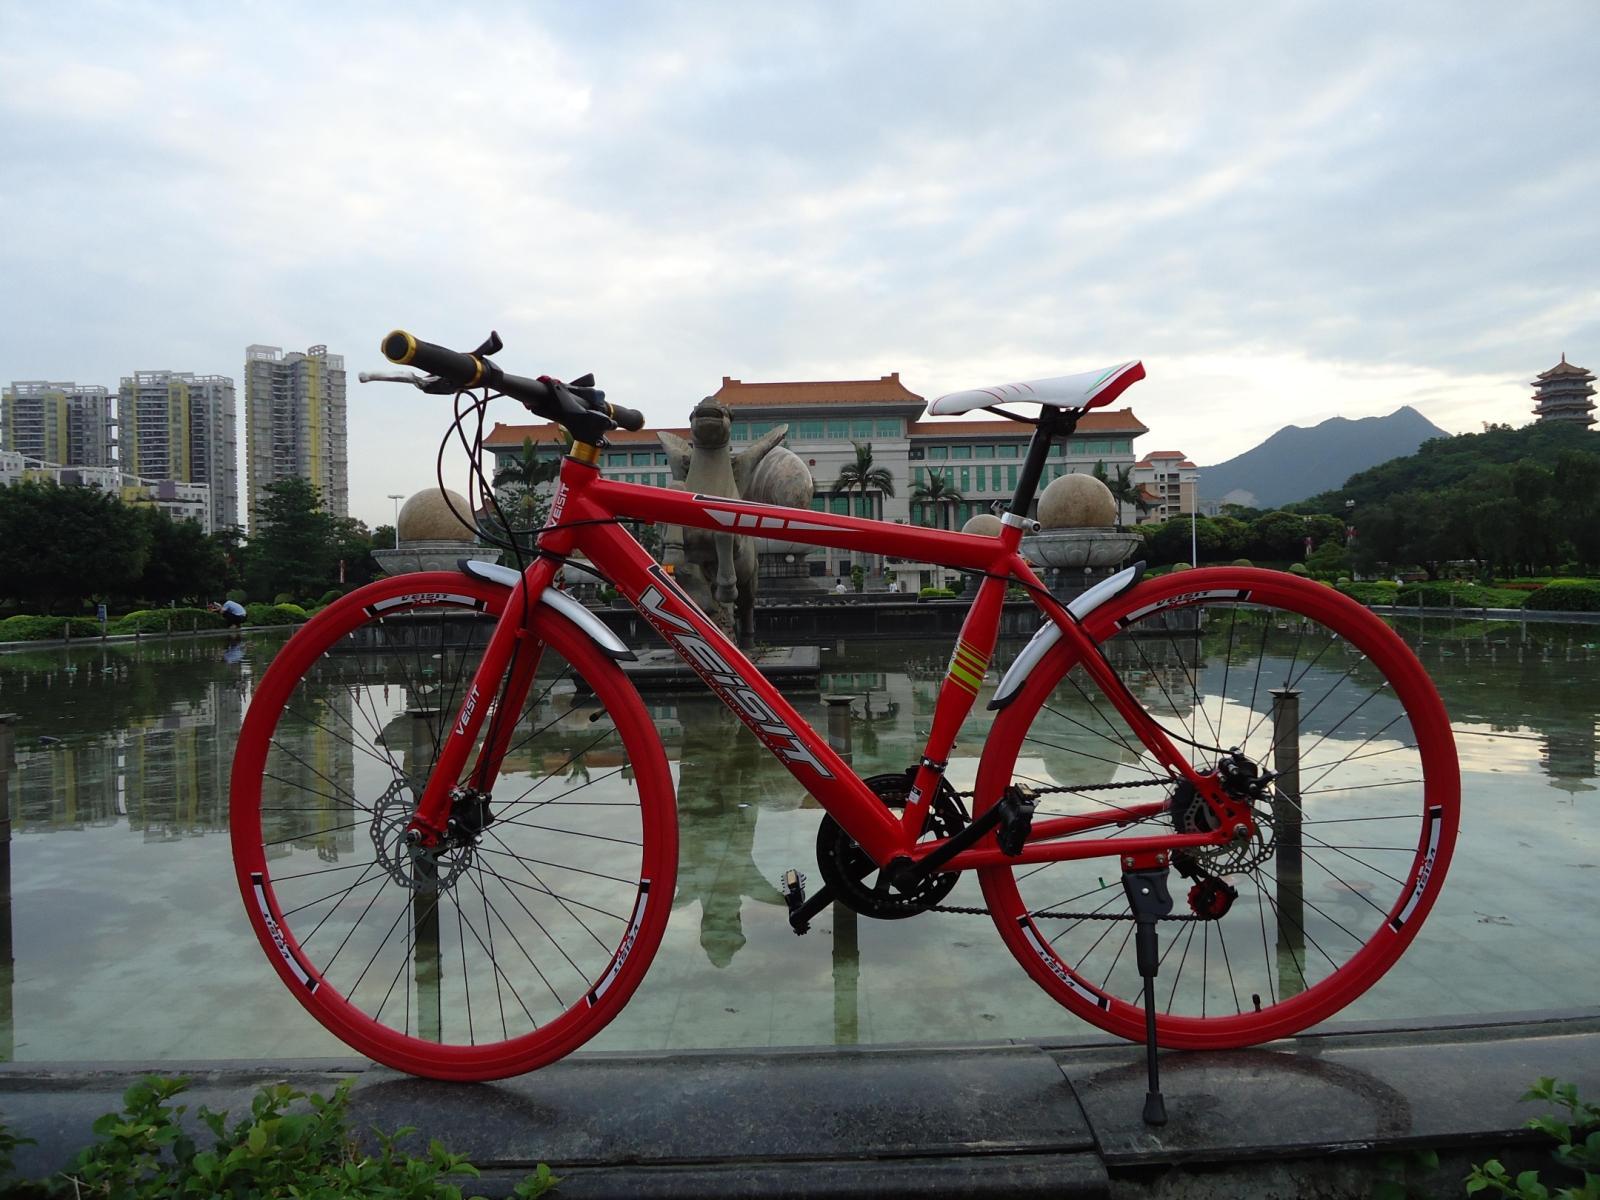 шоссейный велосипед Wister 16689023 700